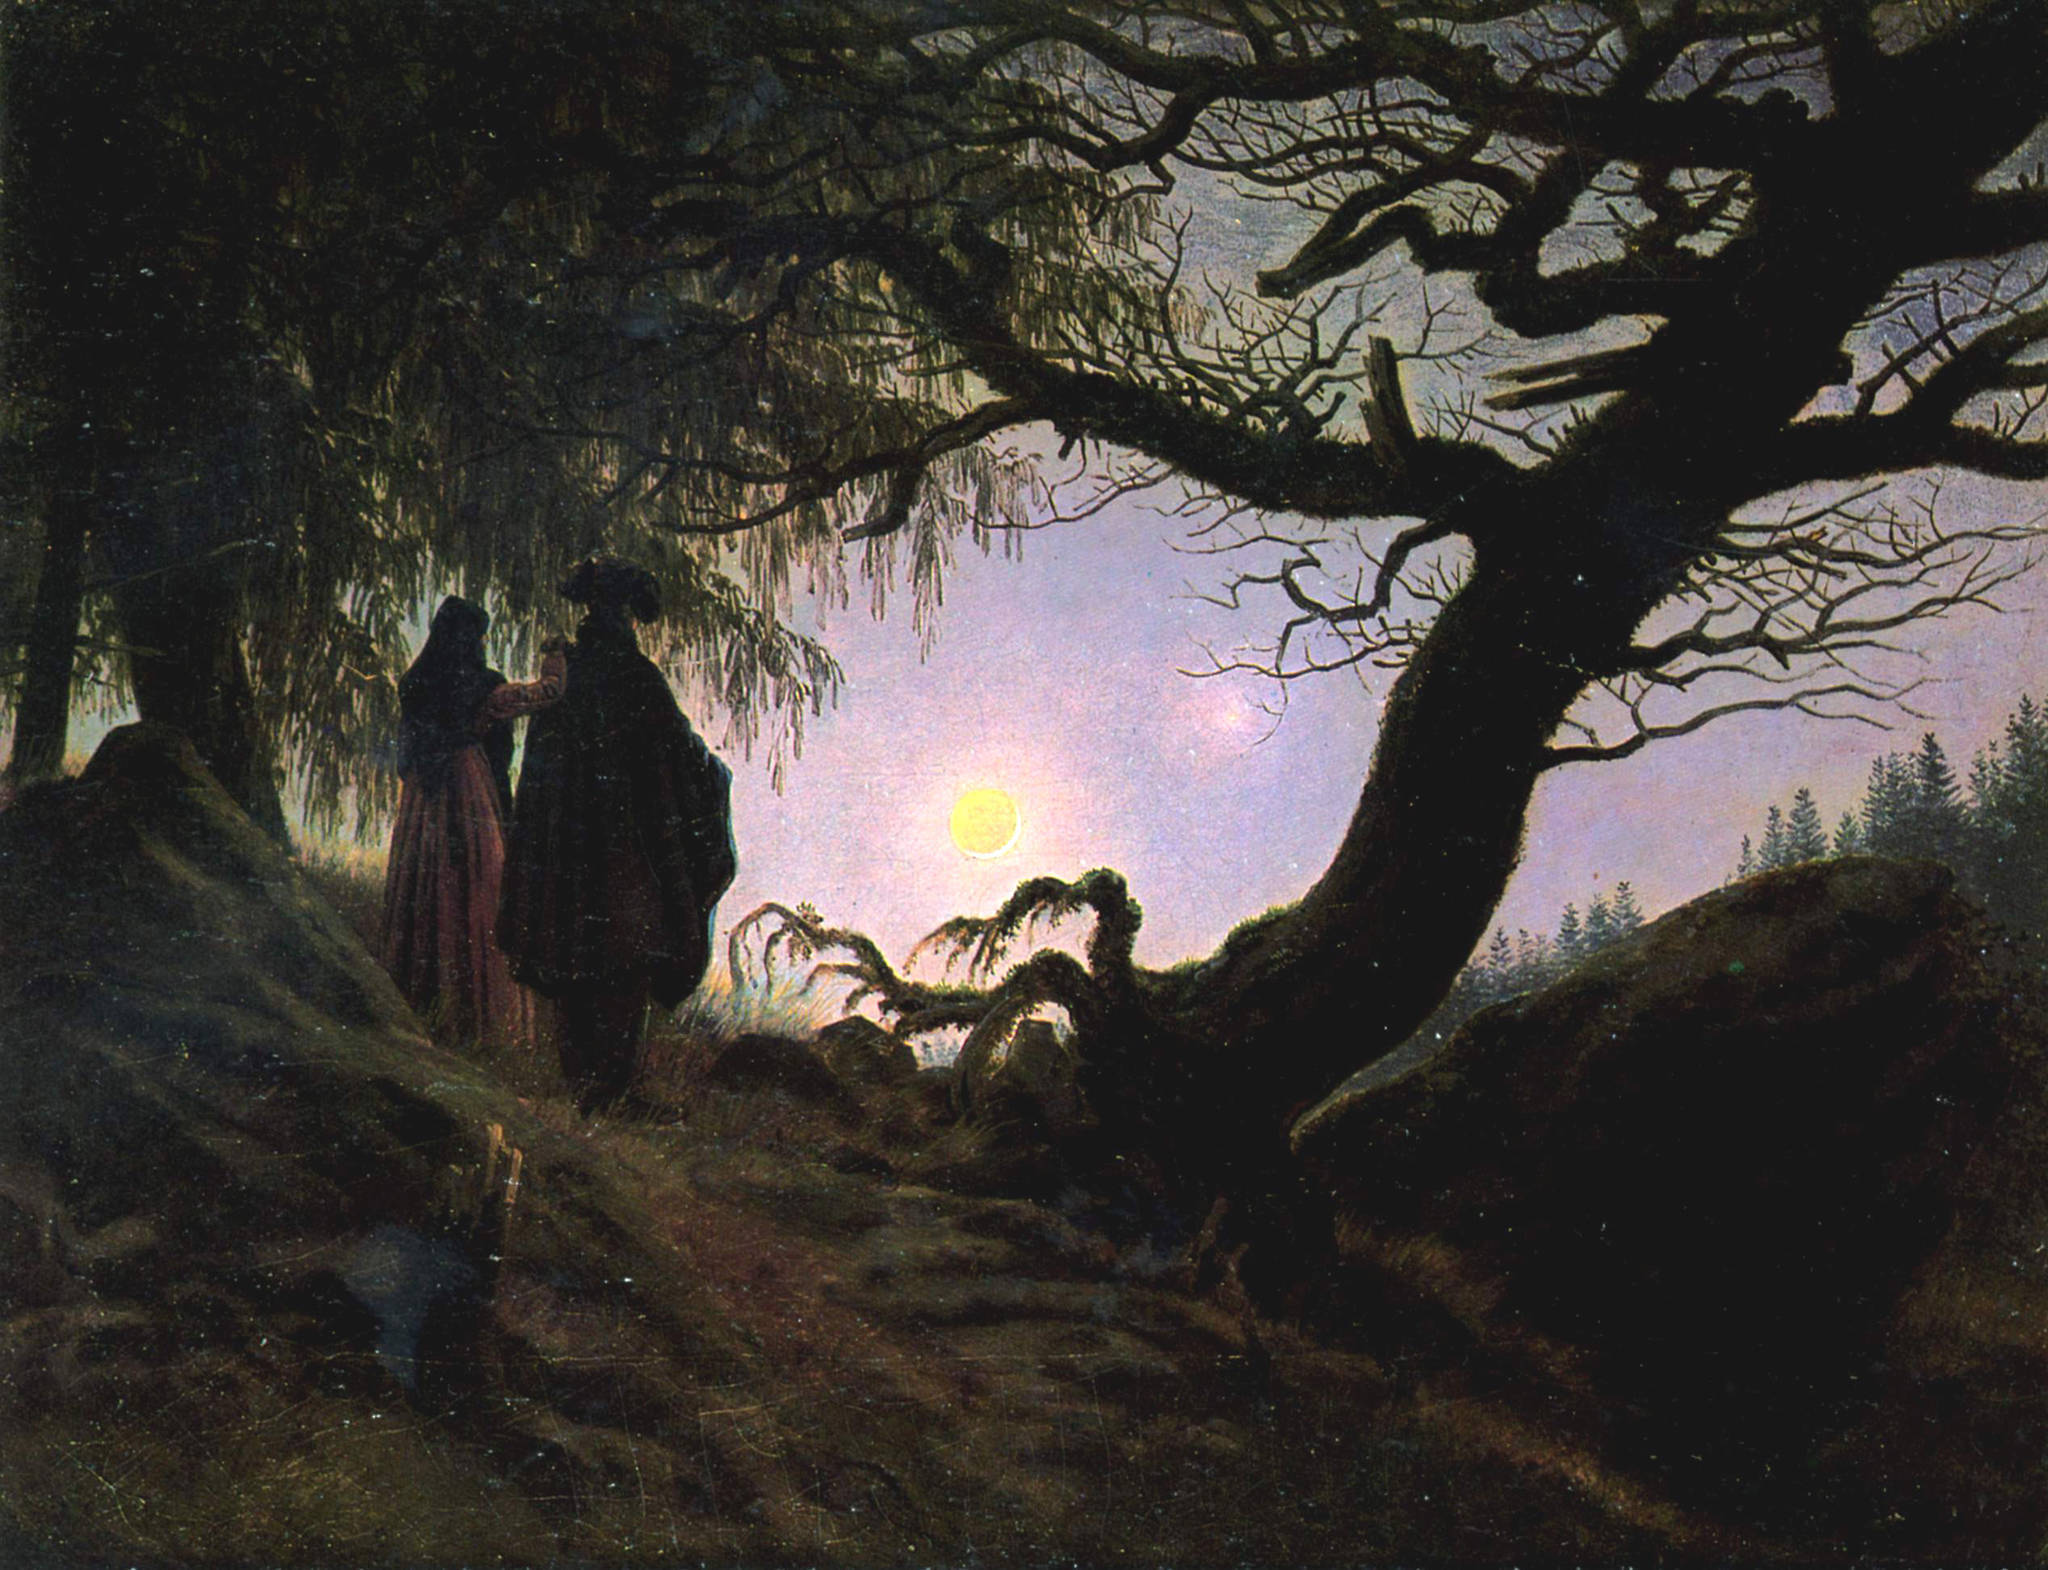 Двое, созерцающие луну. Давид Каспар.